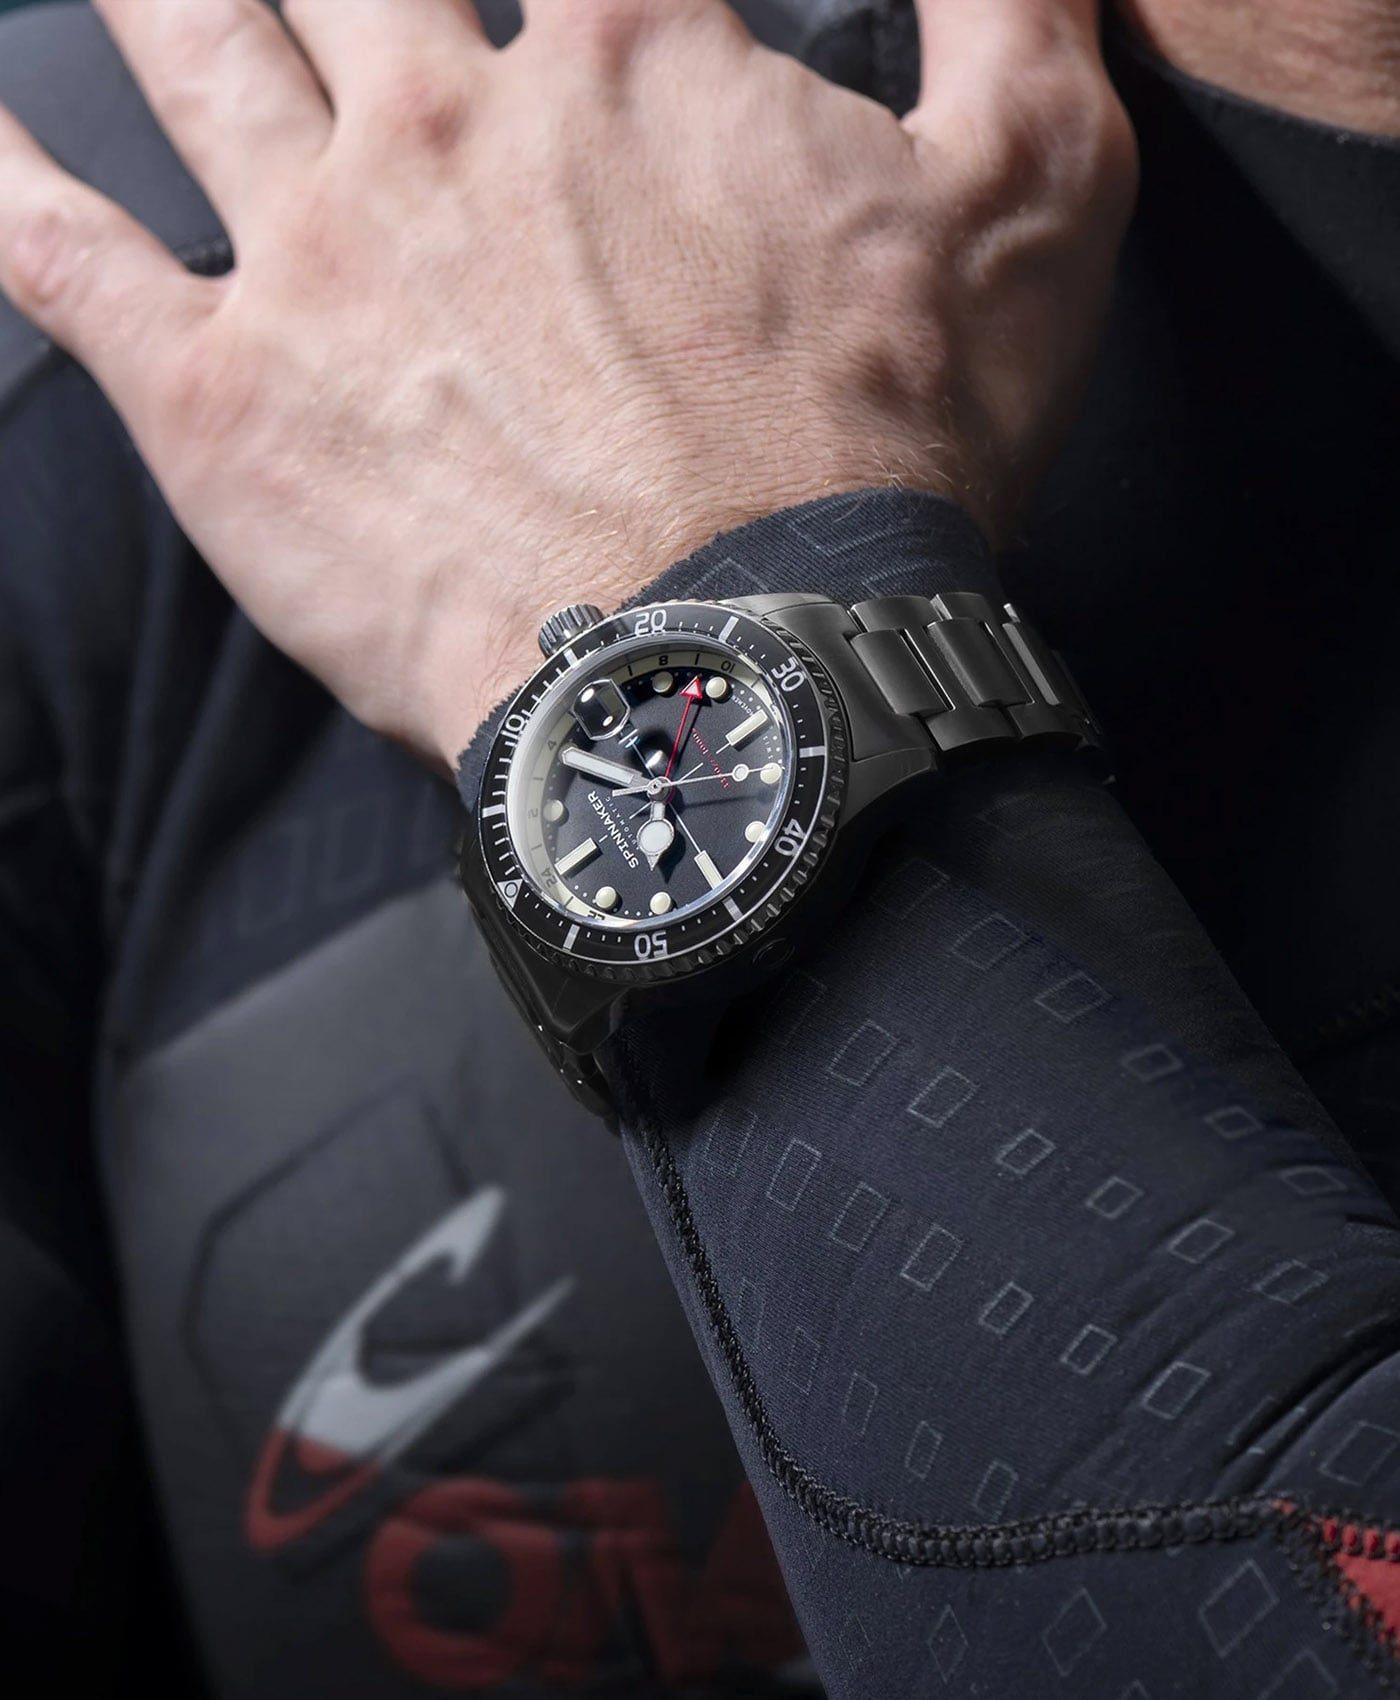 Spinnaker Tesei Mille Metri GMT - Midnight Black SP-5091-11 Wrist shot